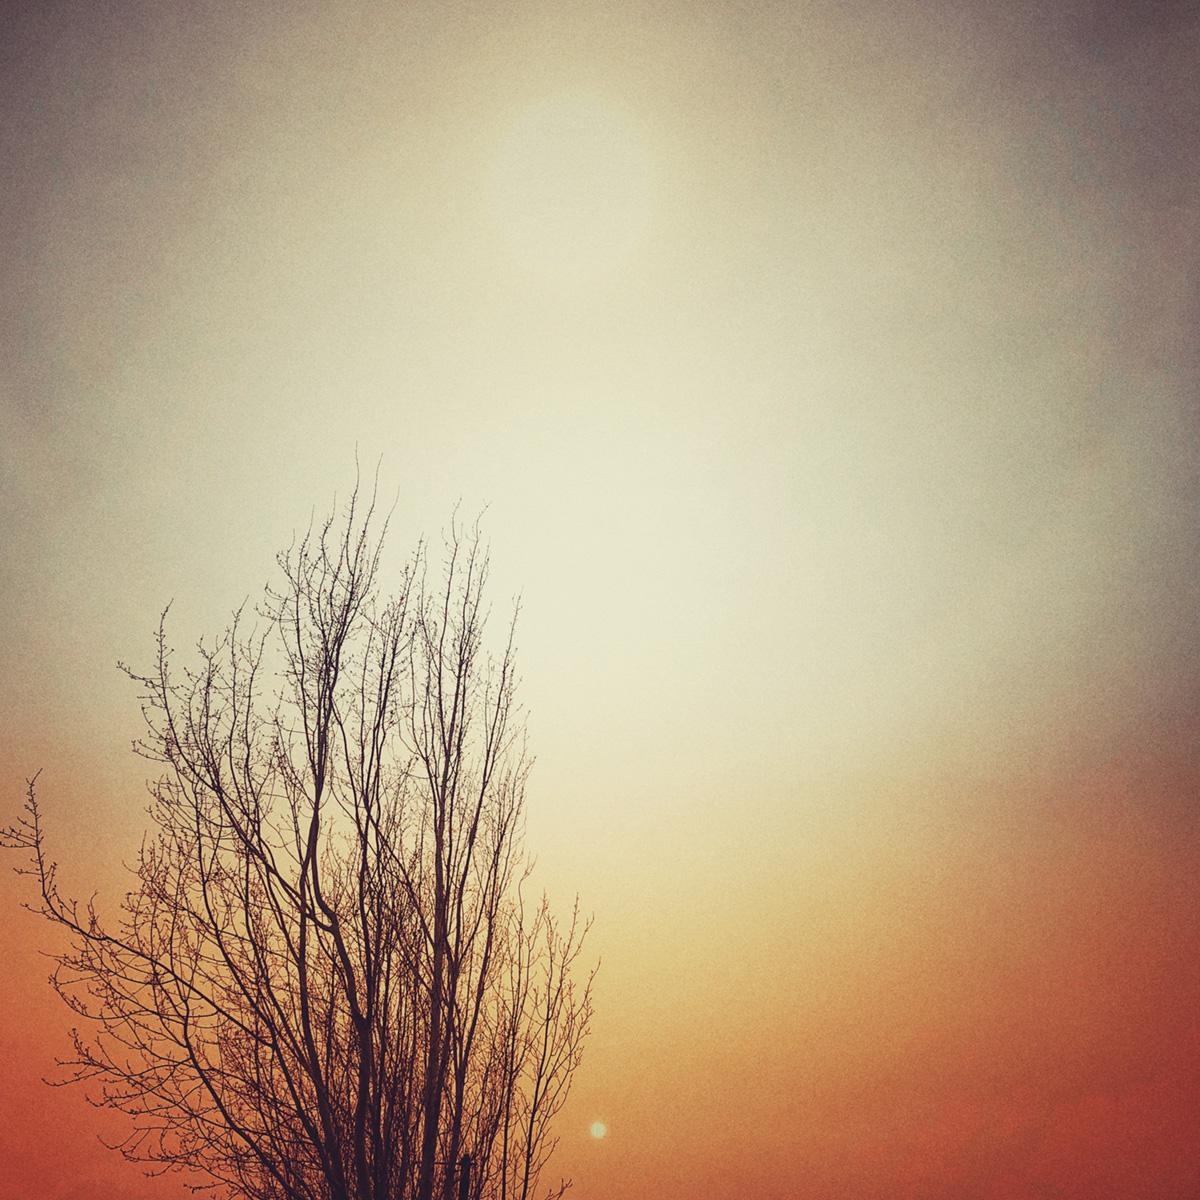 Bare Tree in Smokey Sky